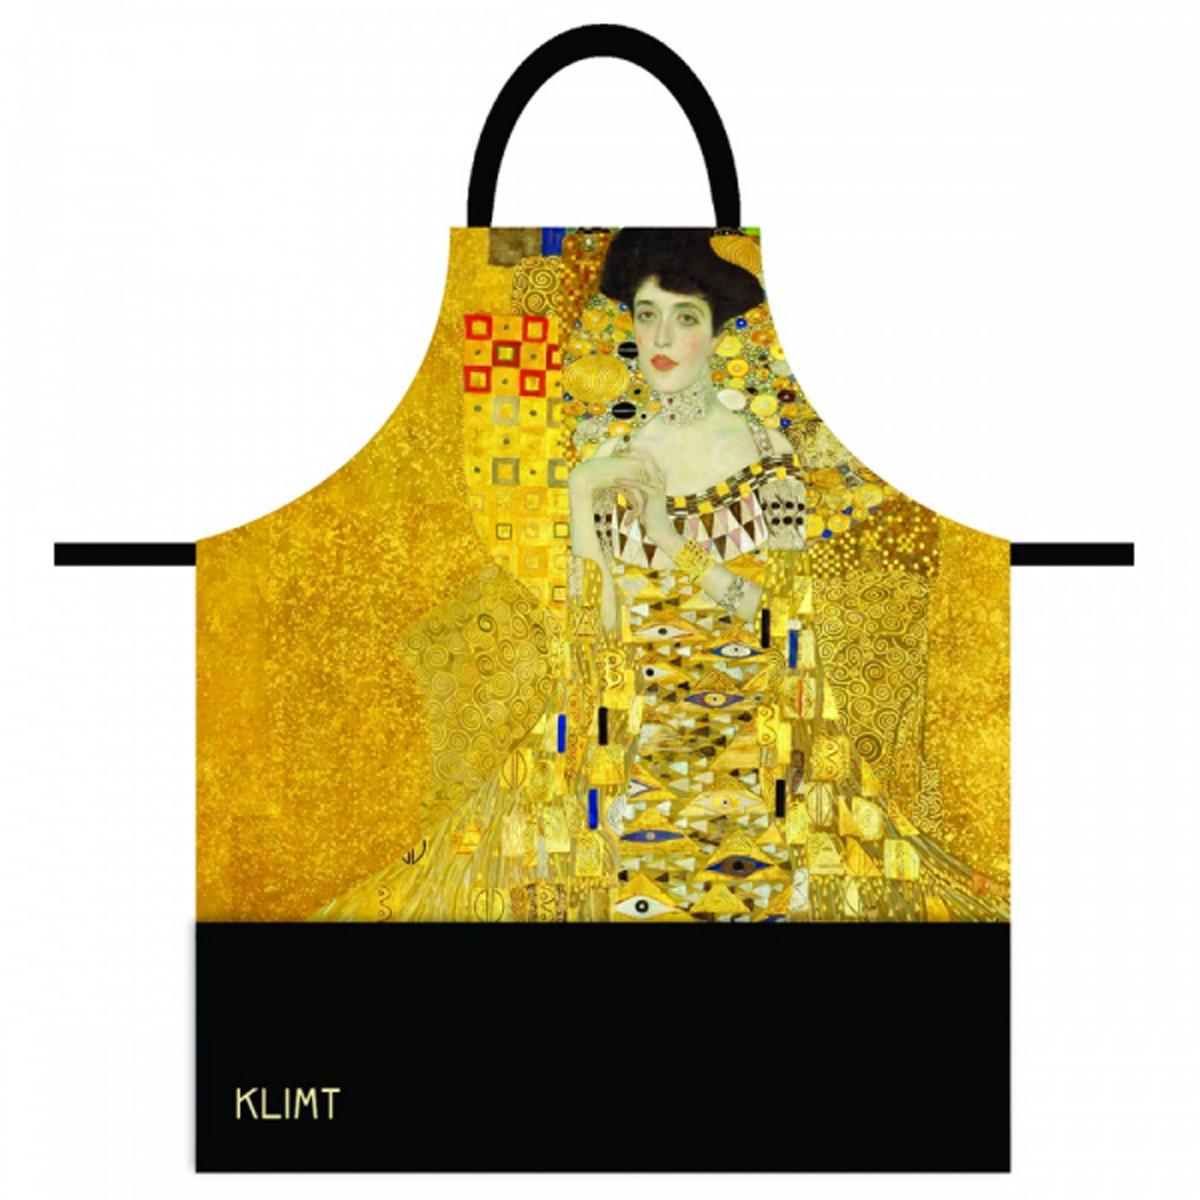 Tablier coton \'Gustav Klimt\' (Adèle) - 78x68 cm - [R2000]